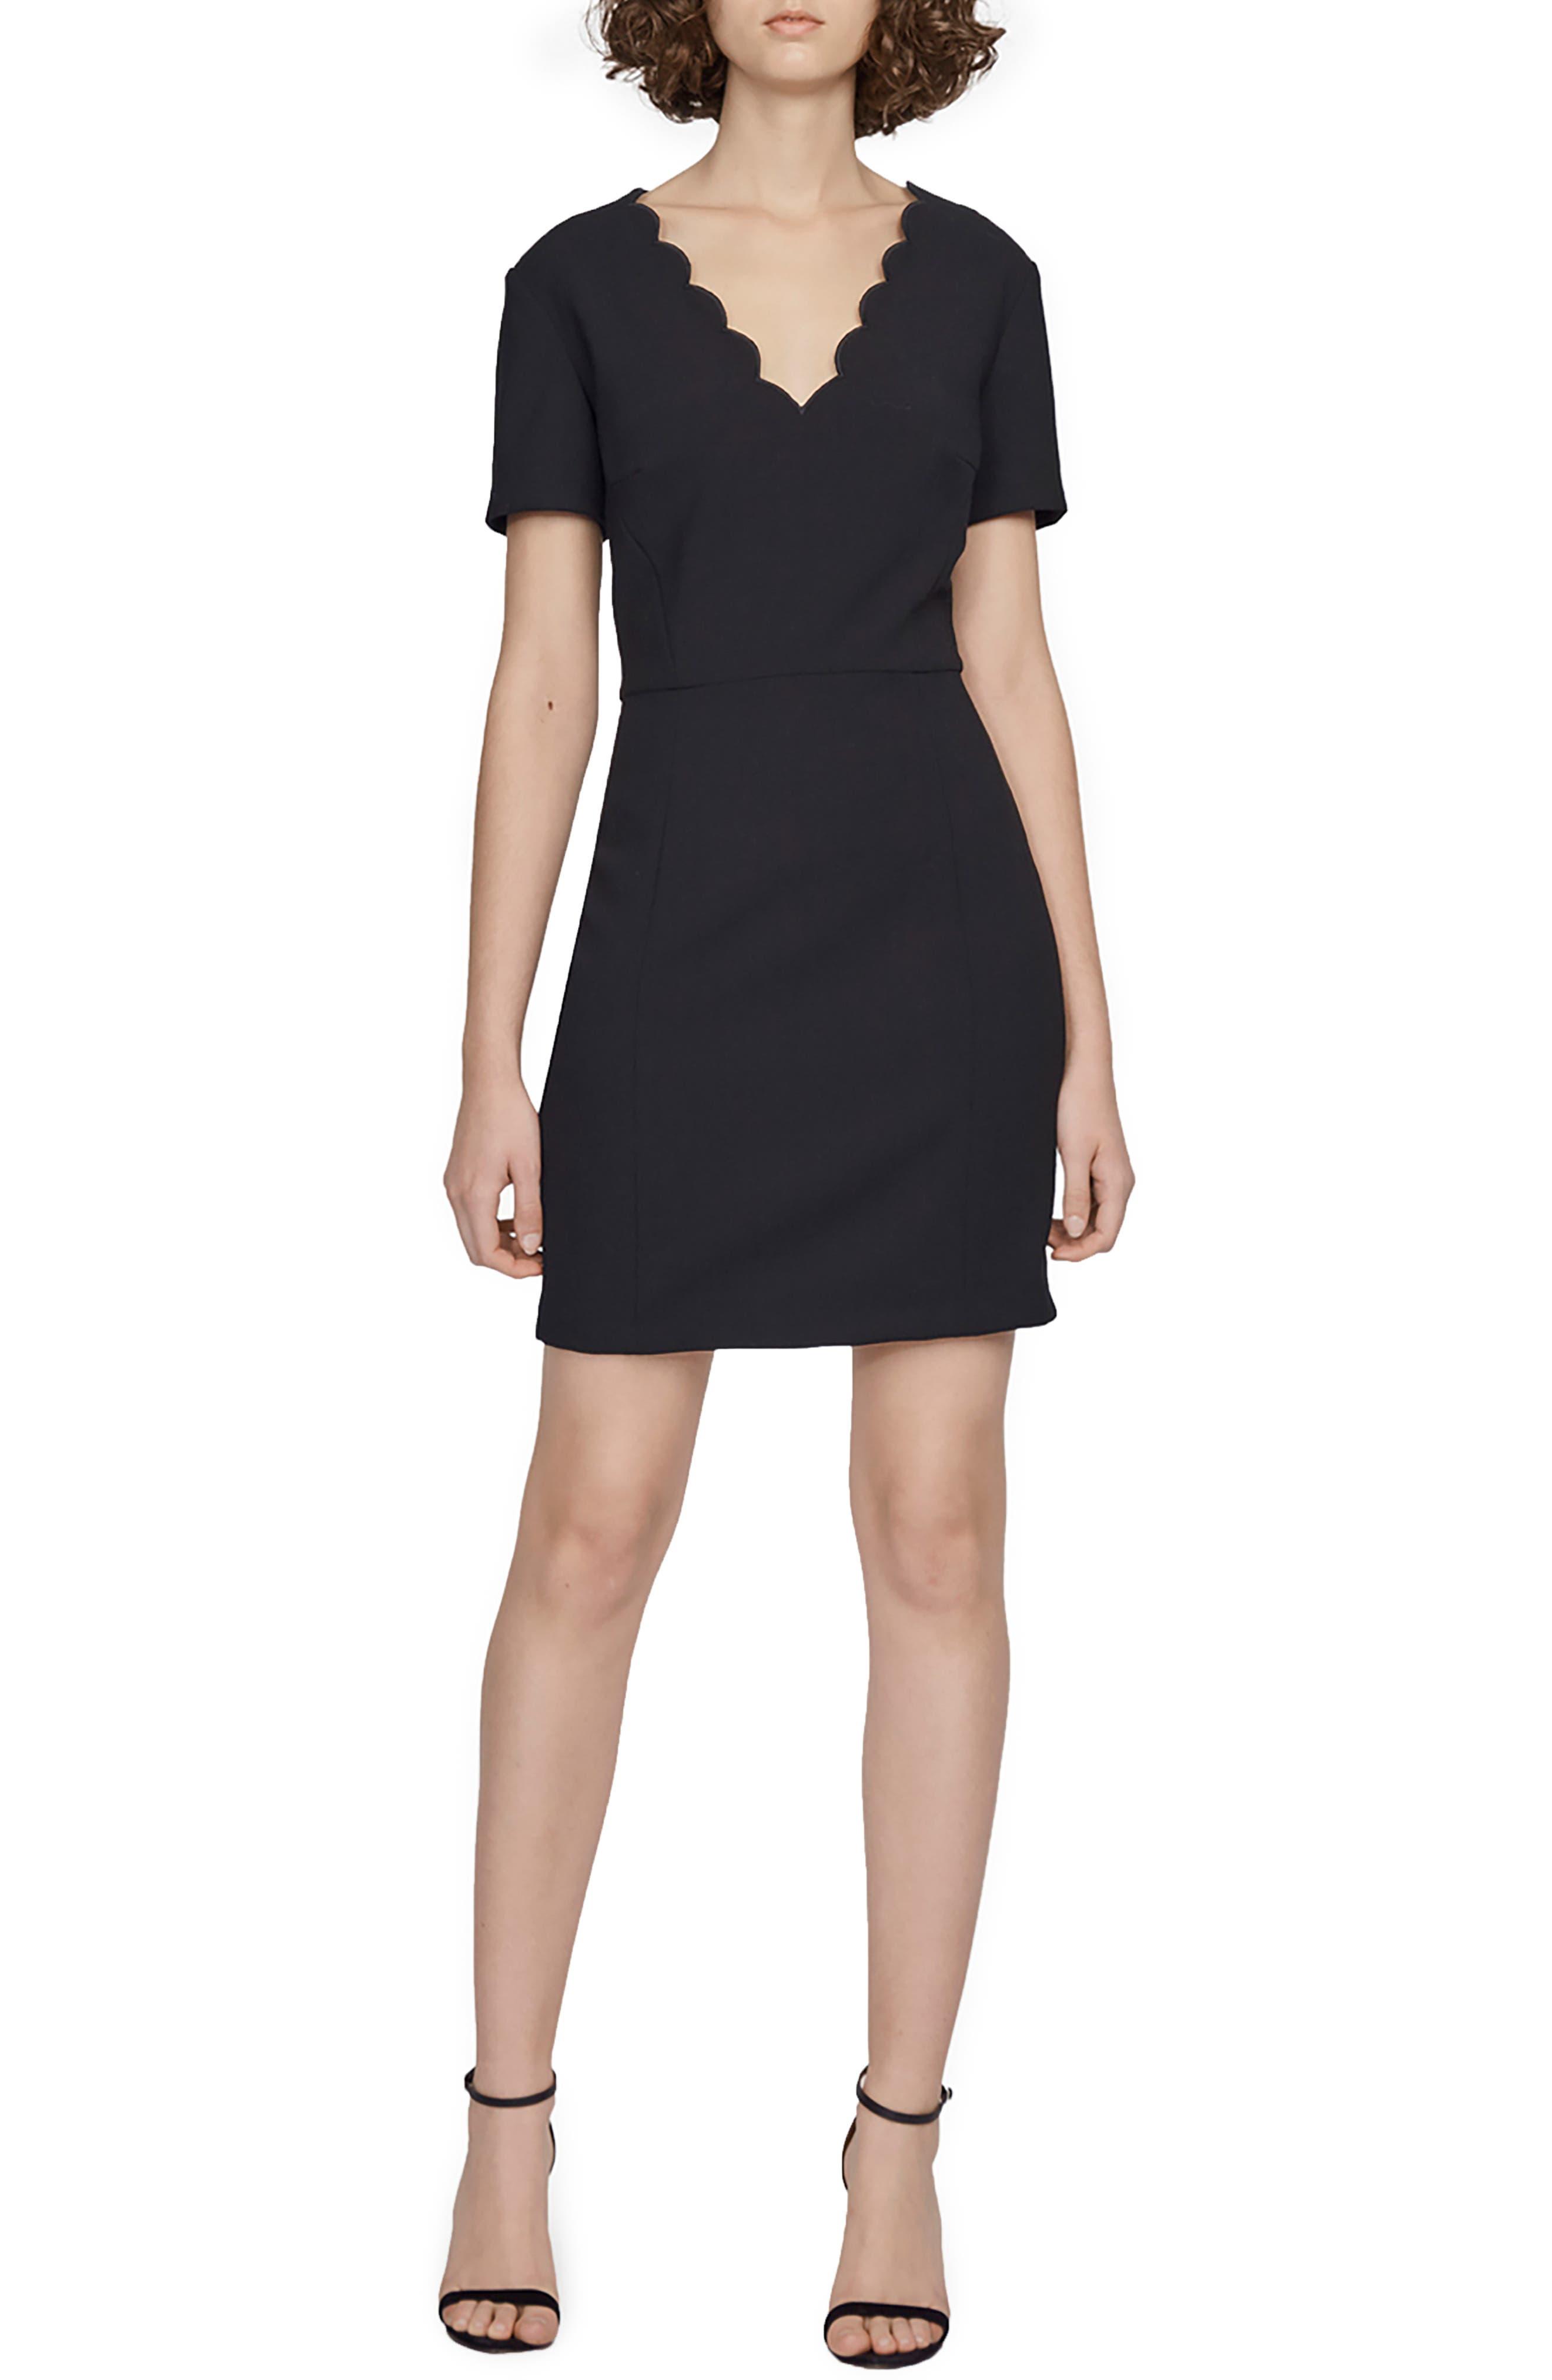 French Connection Lula Scallop Sheath Dress, Black